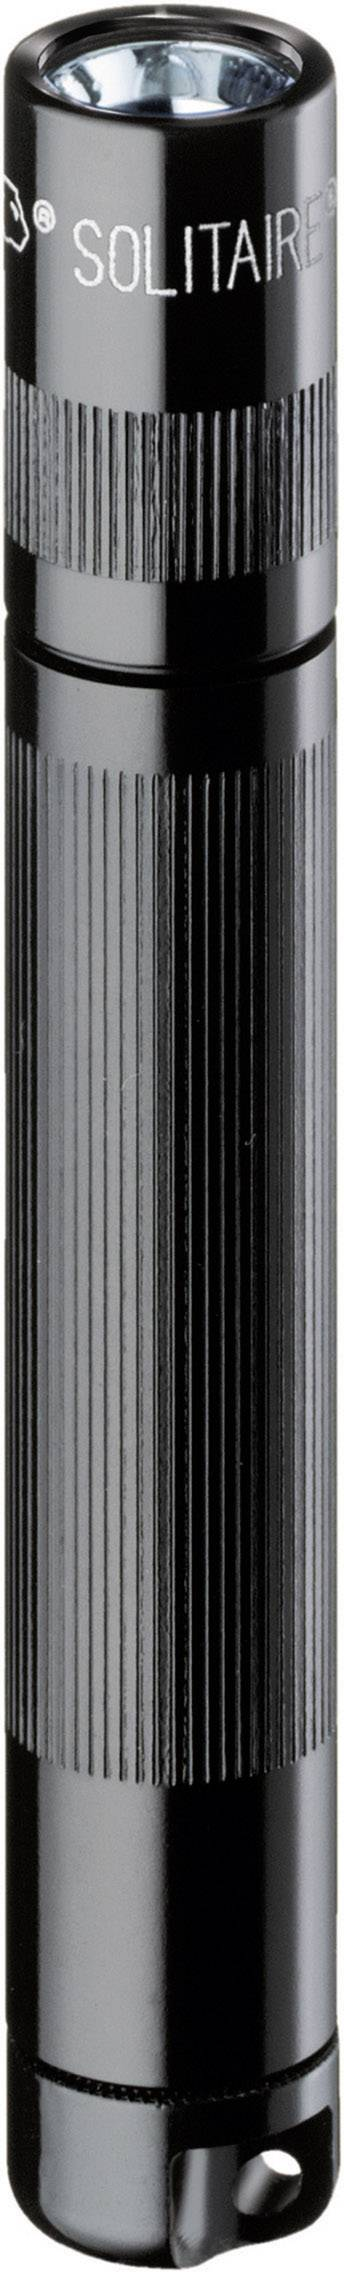 LED svítilna na klíčenku Mag-Lite Solitaire, SJ3A016, černá